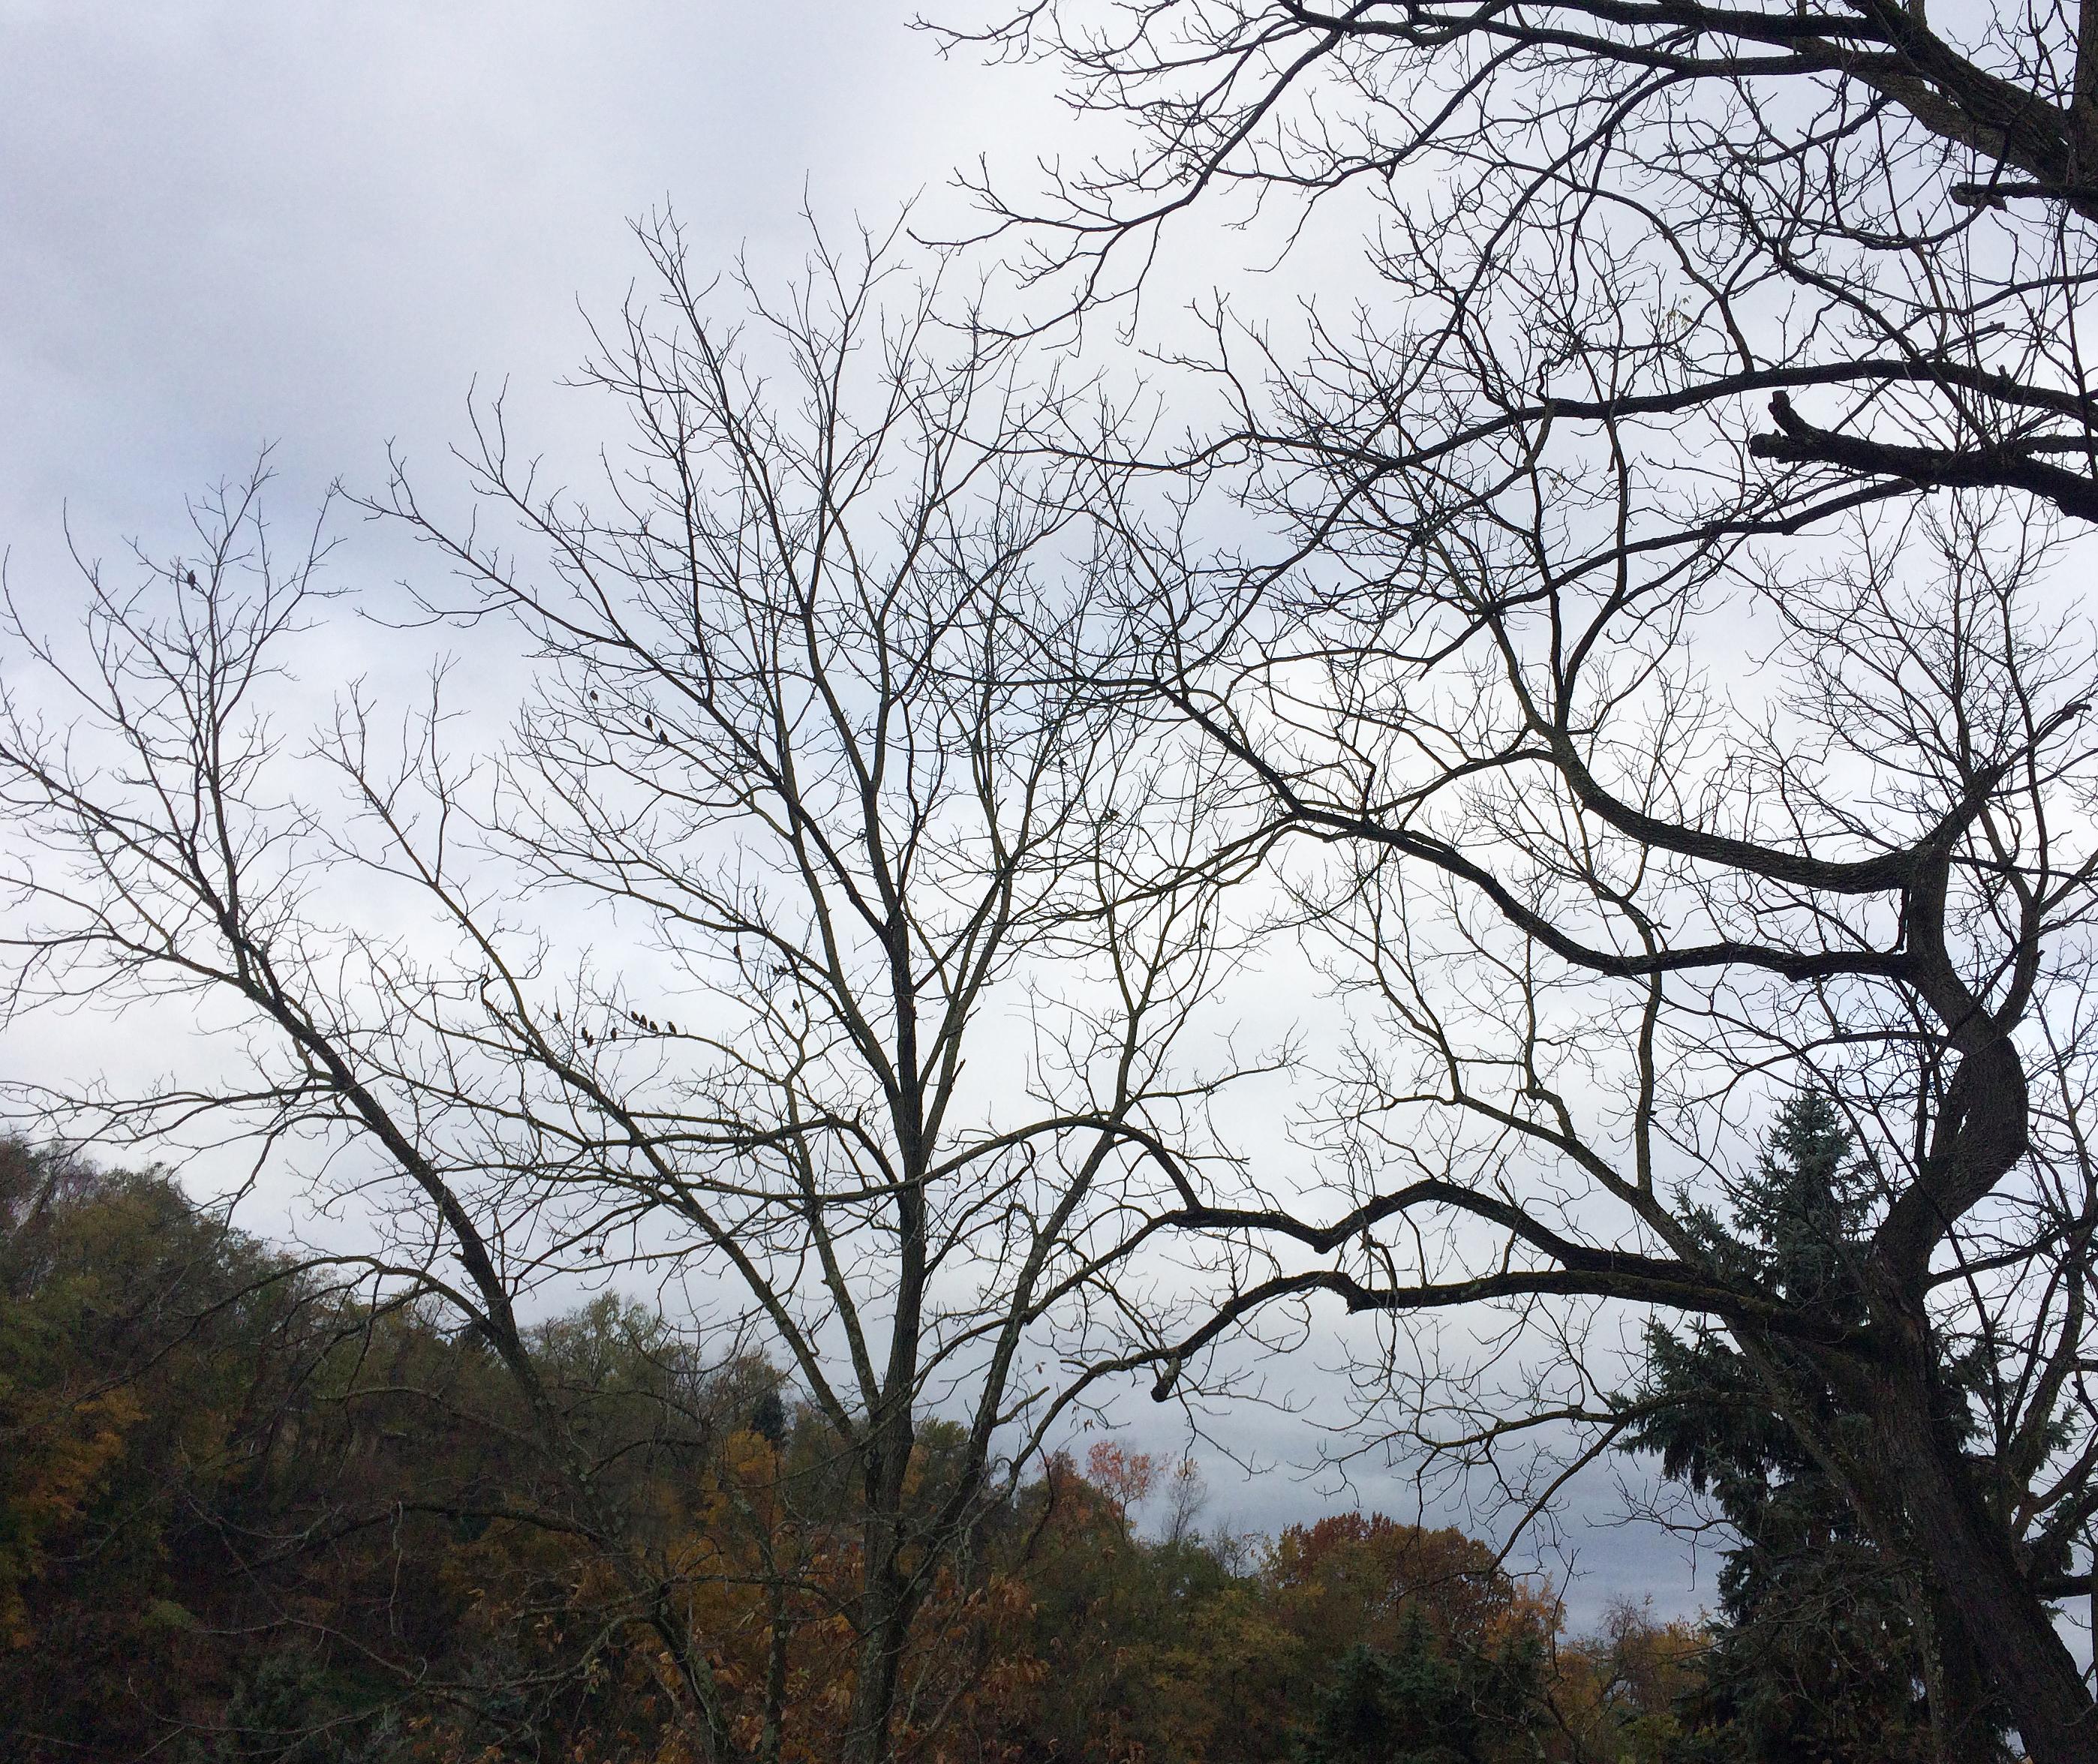 trees and grey skies